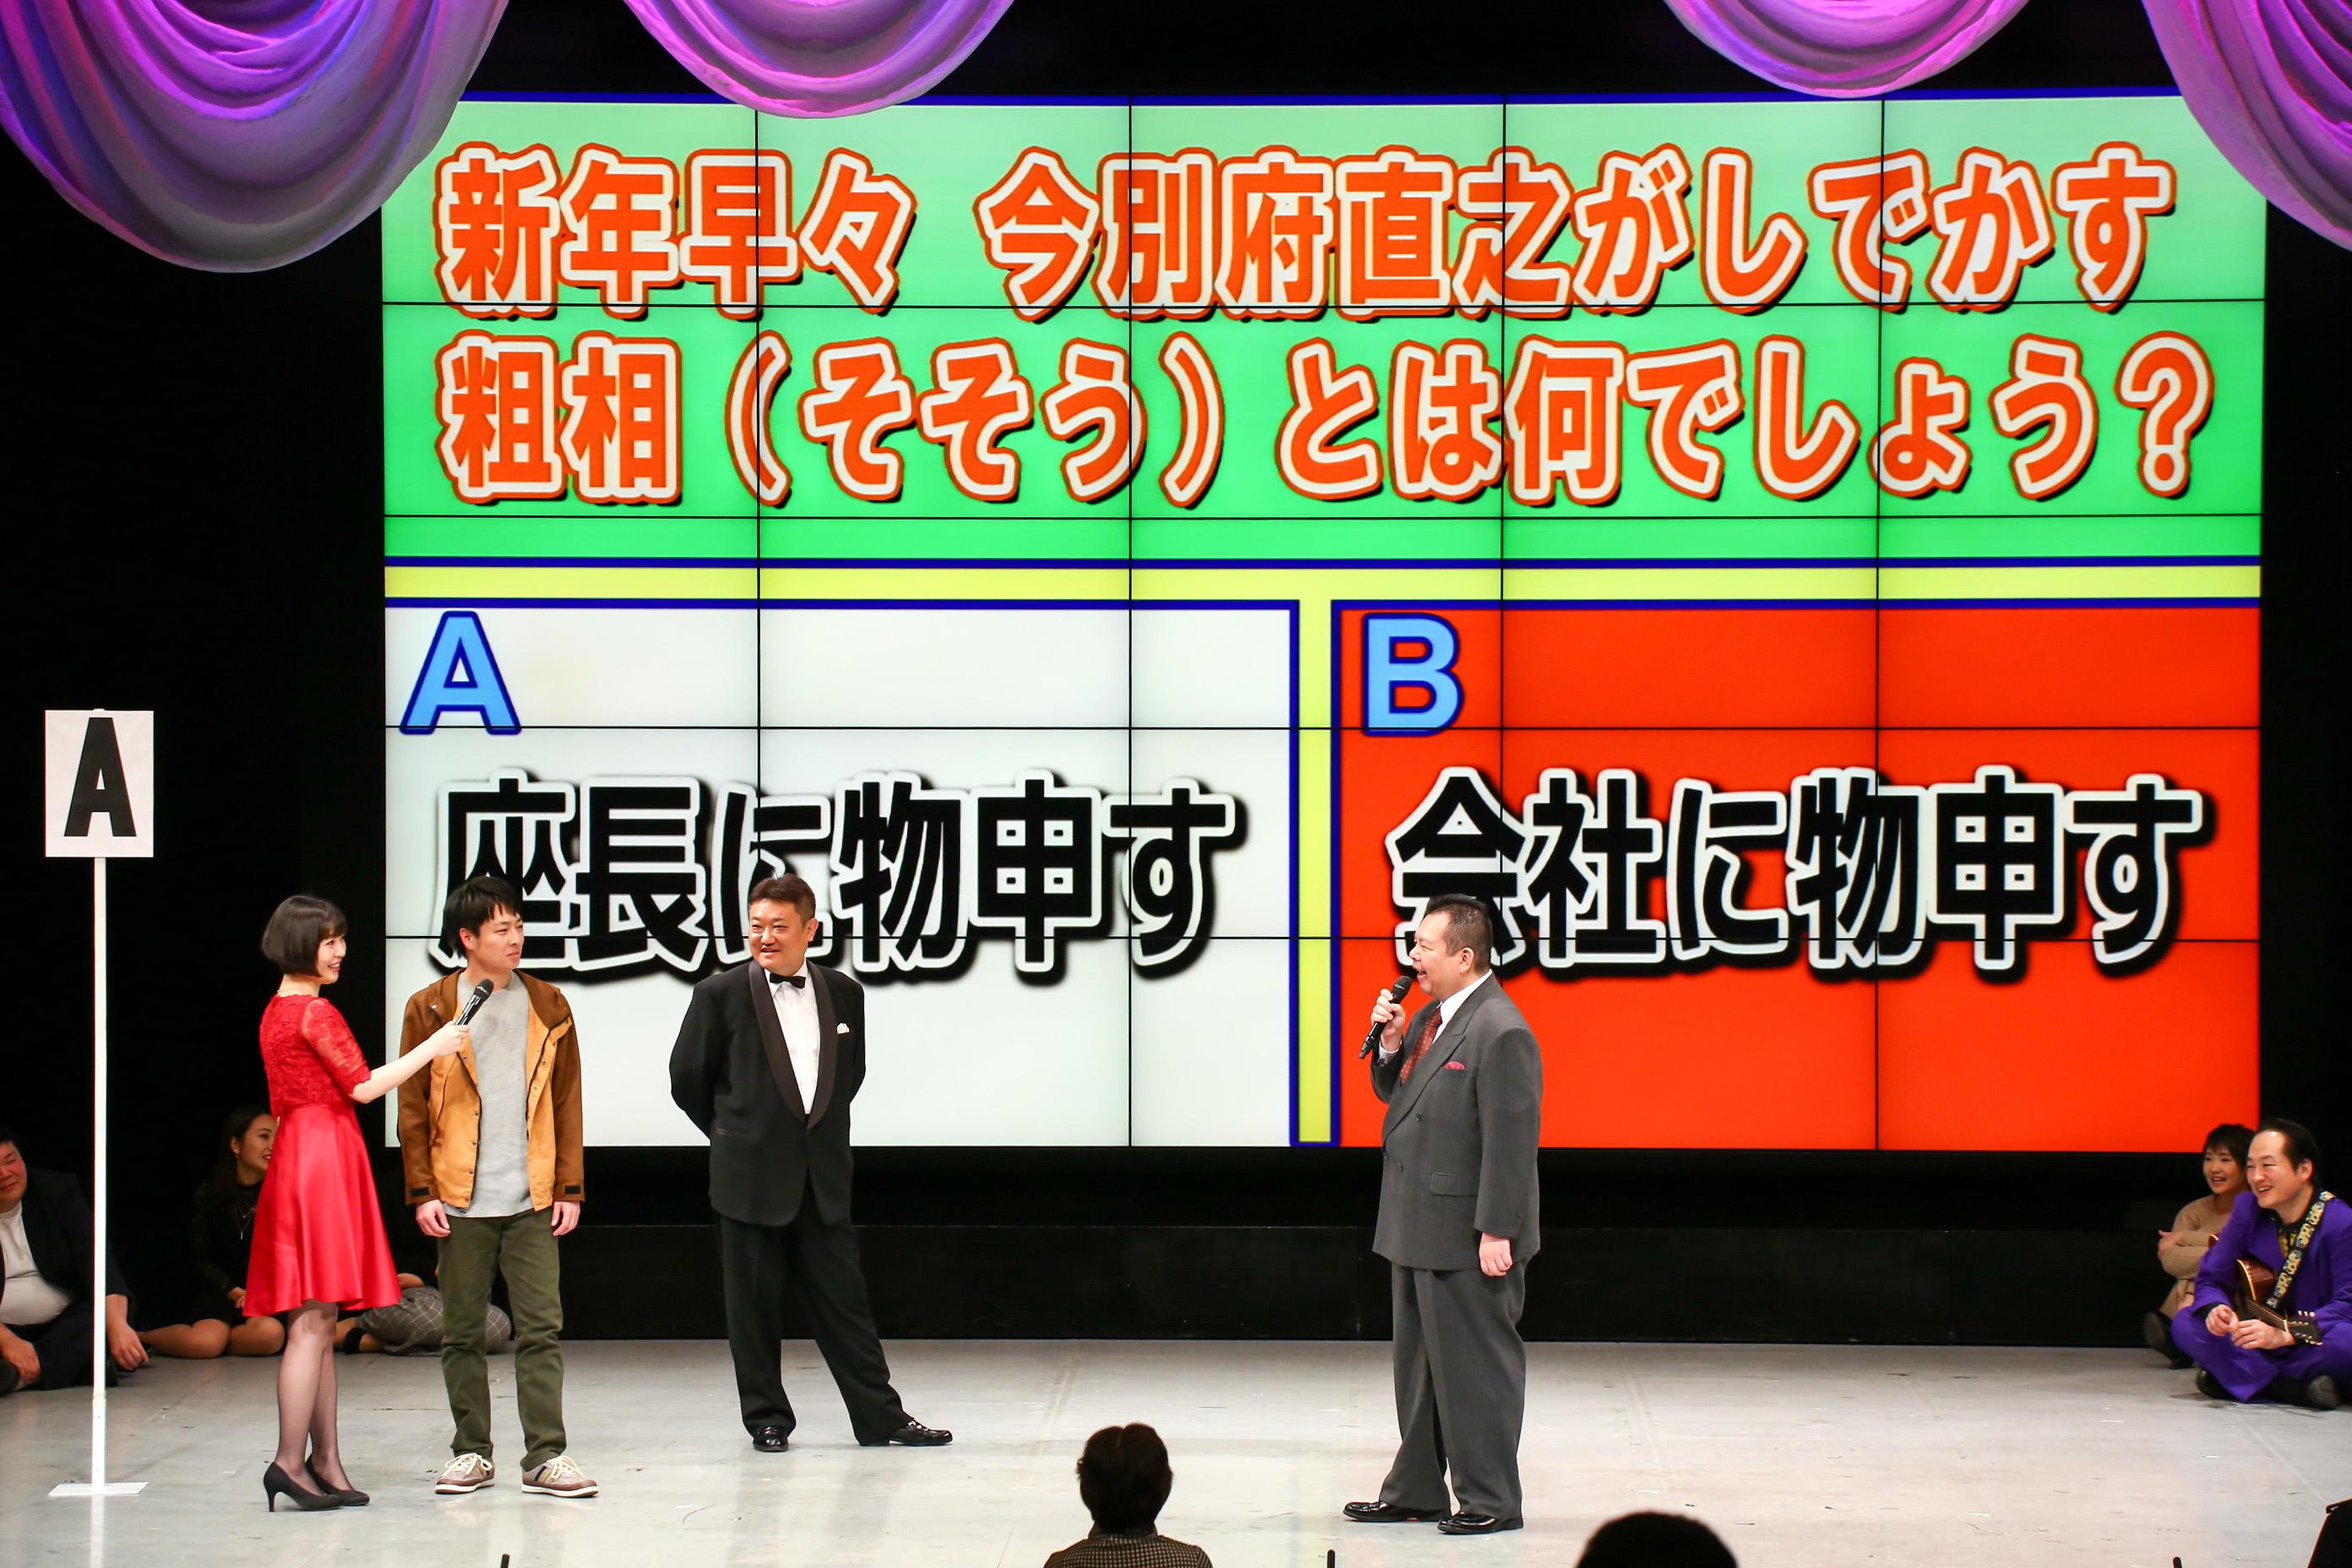 http://news.yoshimoto.co.jp/20190101033446-985258c0520fbe83e35ad20543aad9d92f89184b.jpg